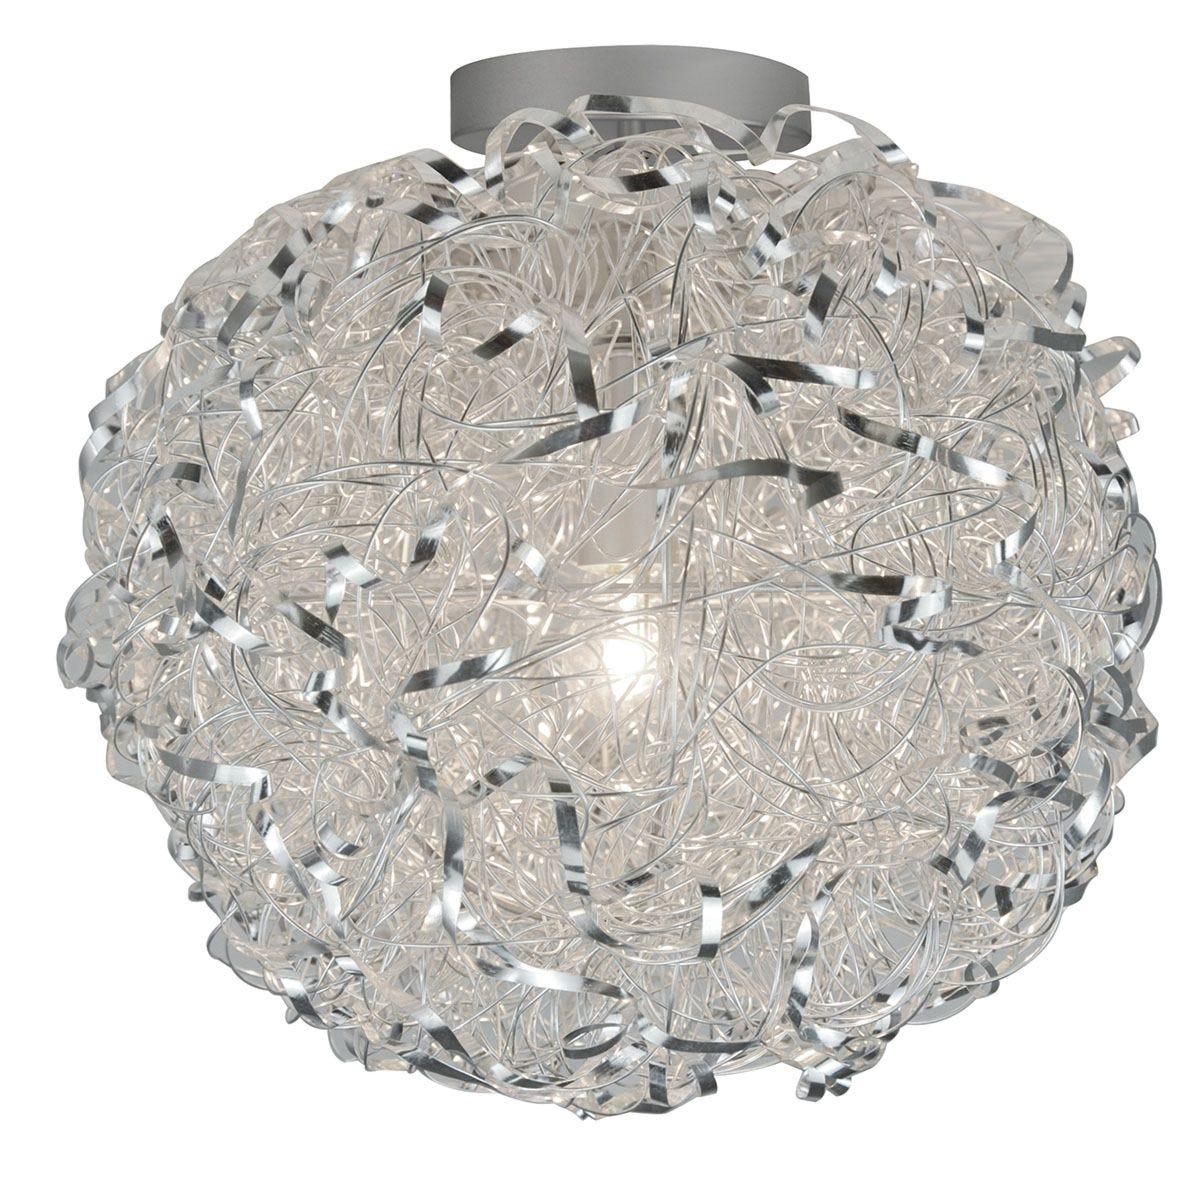 Wofi Fortune Flush Fitting Ceiling Light - Silver